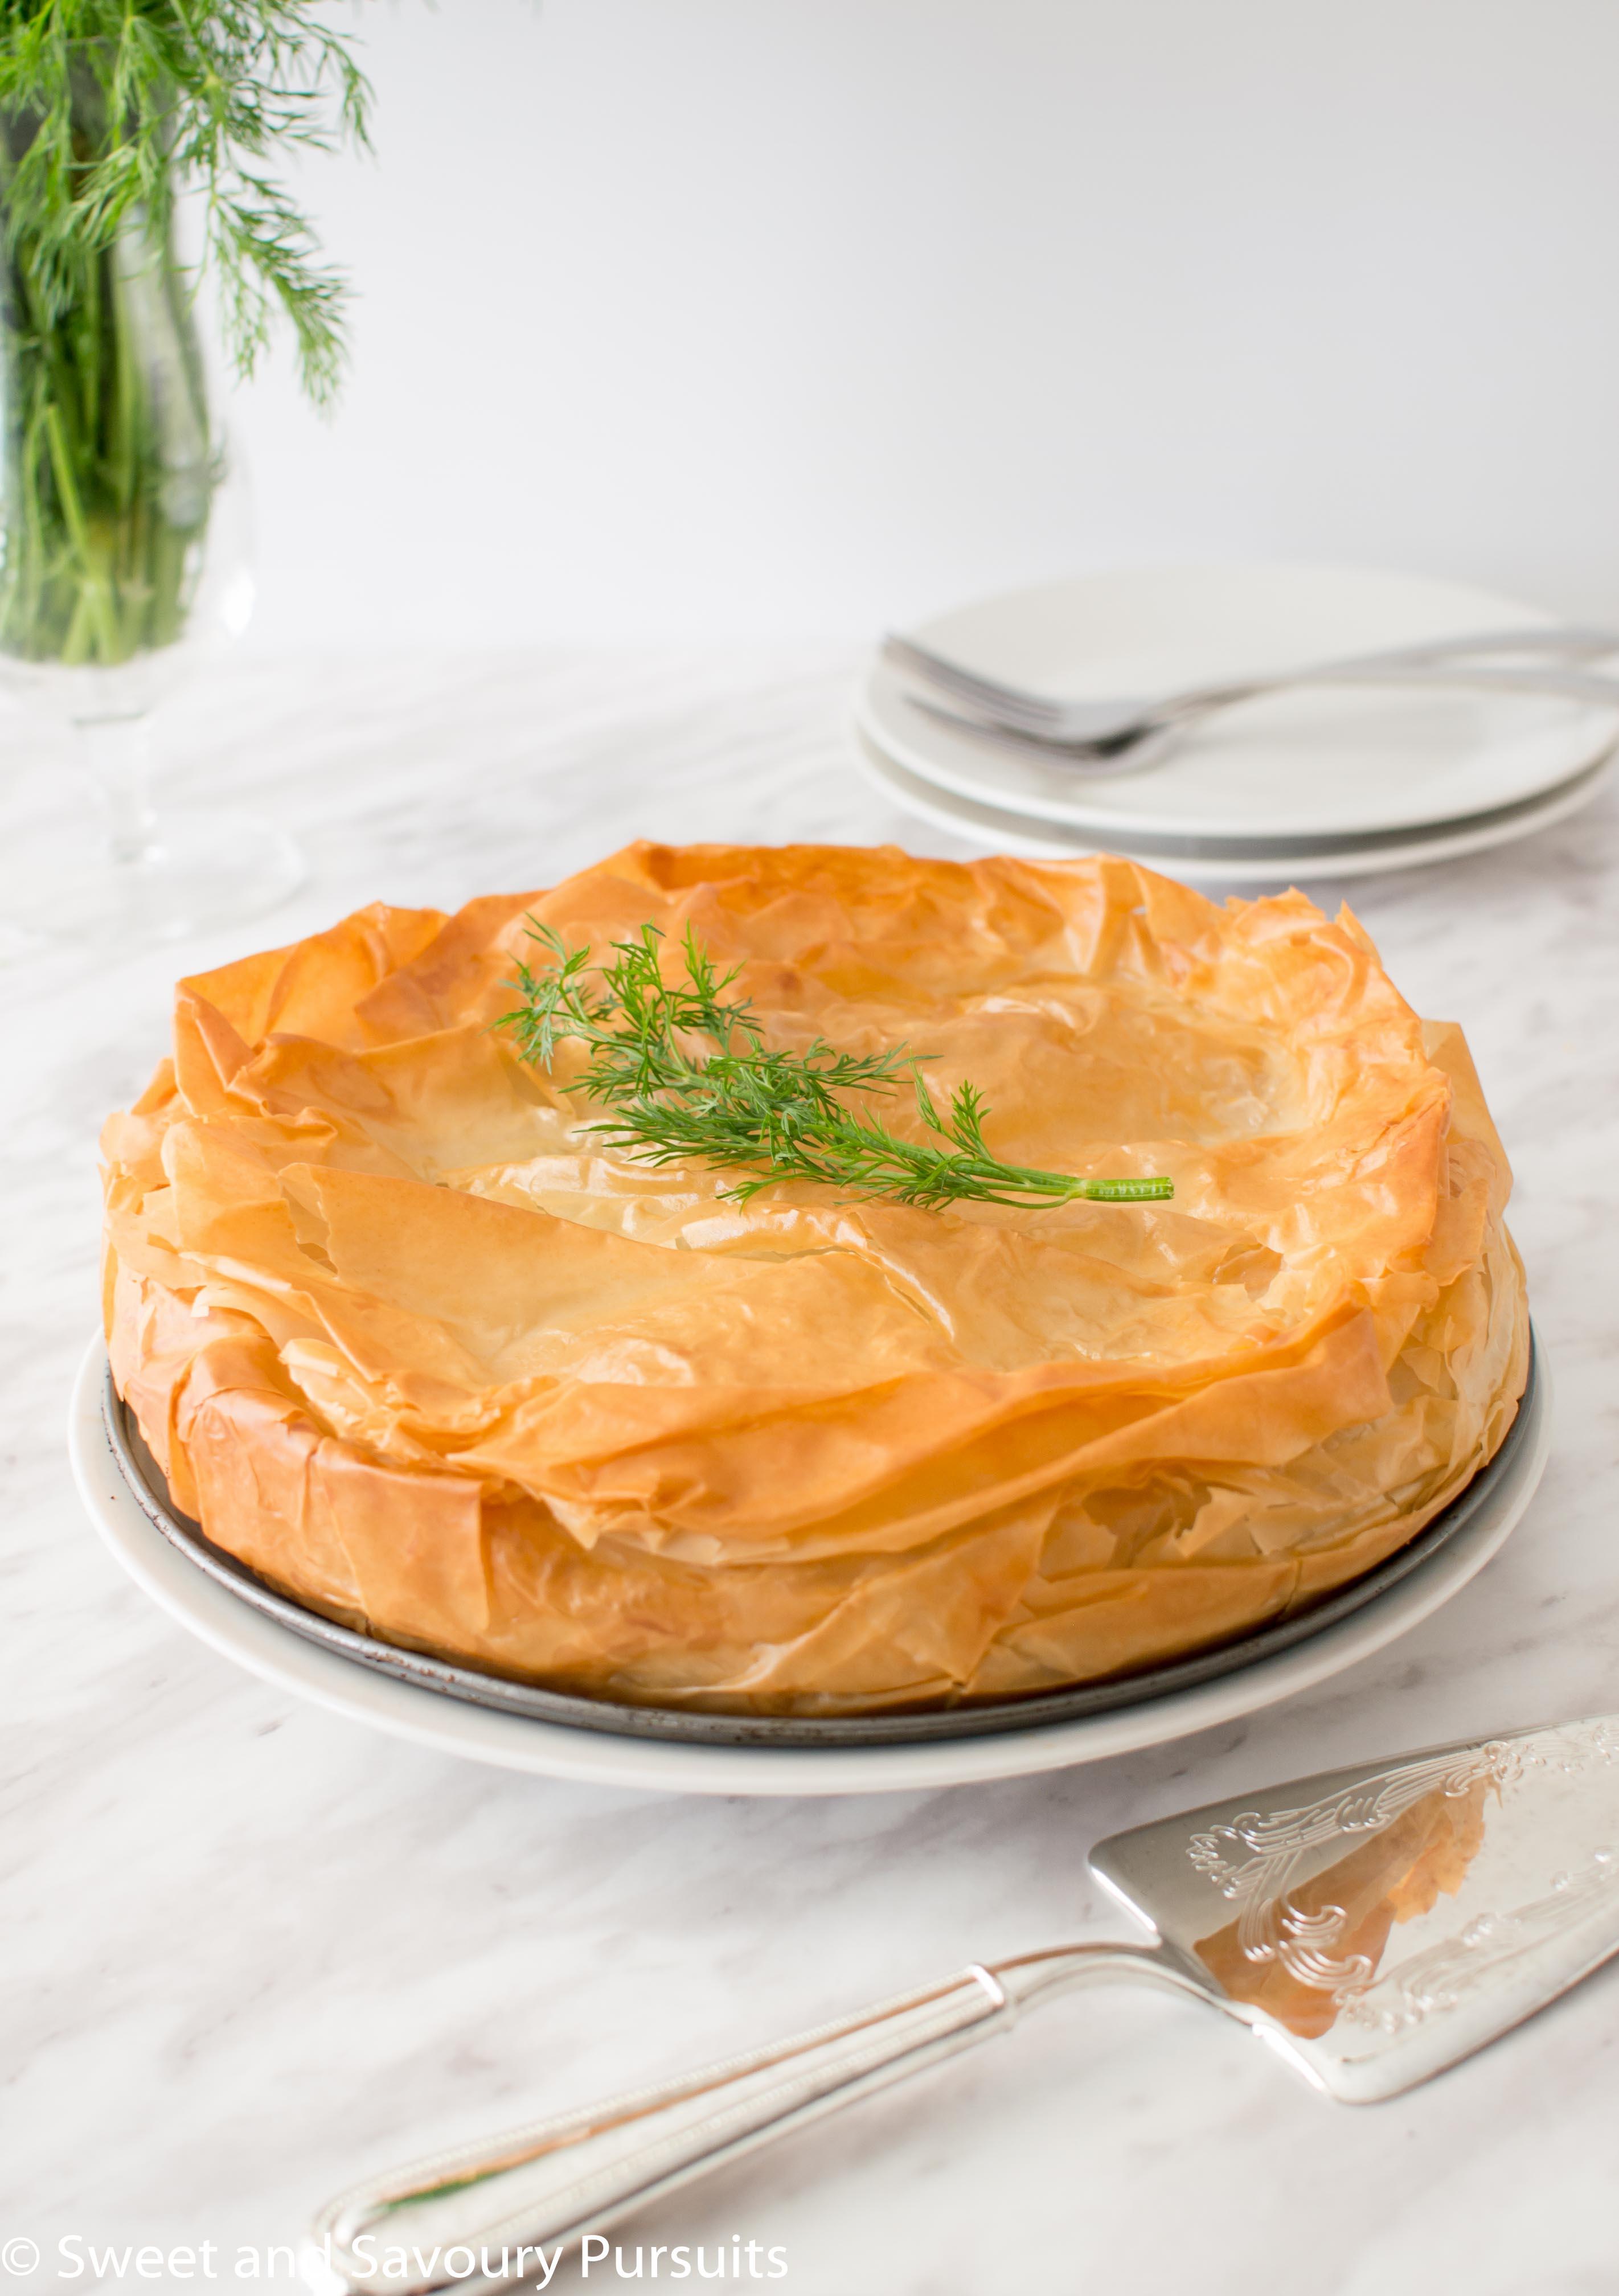 One large Spanakopita pie.